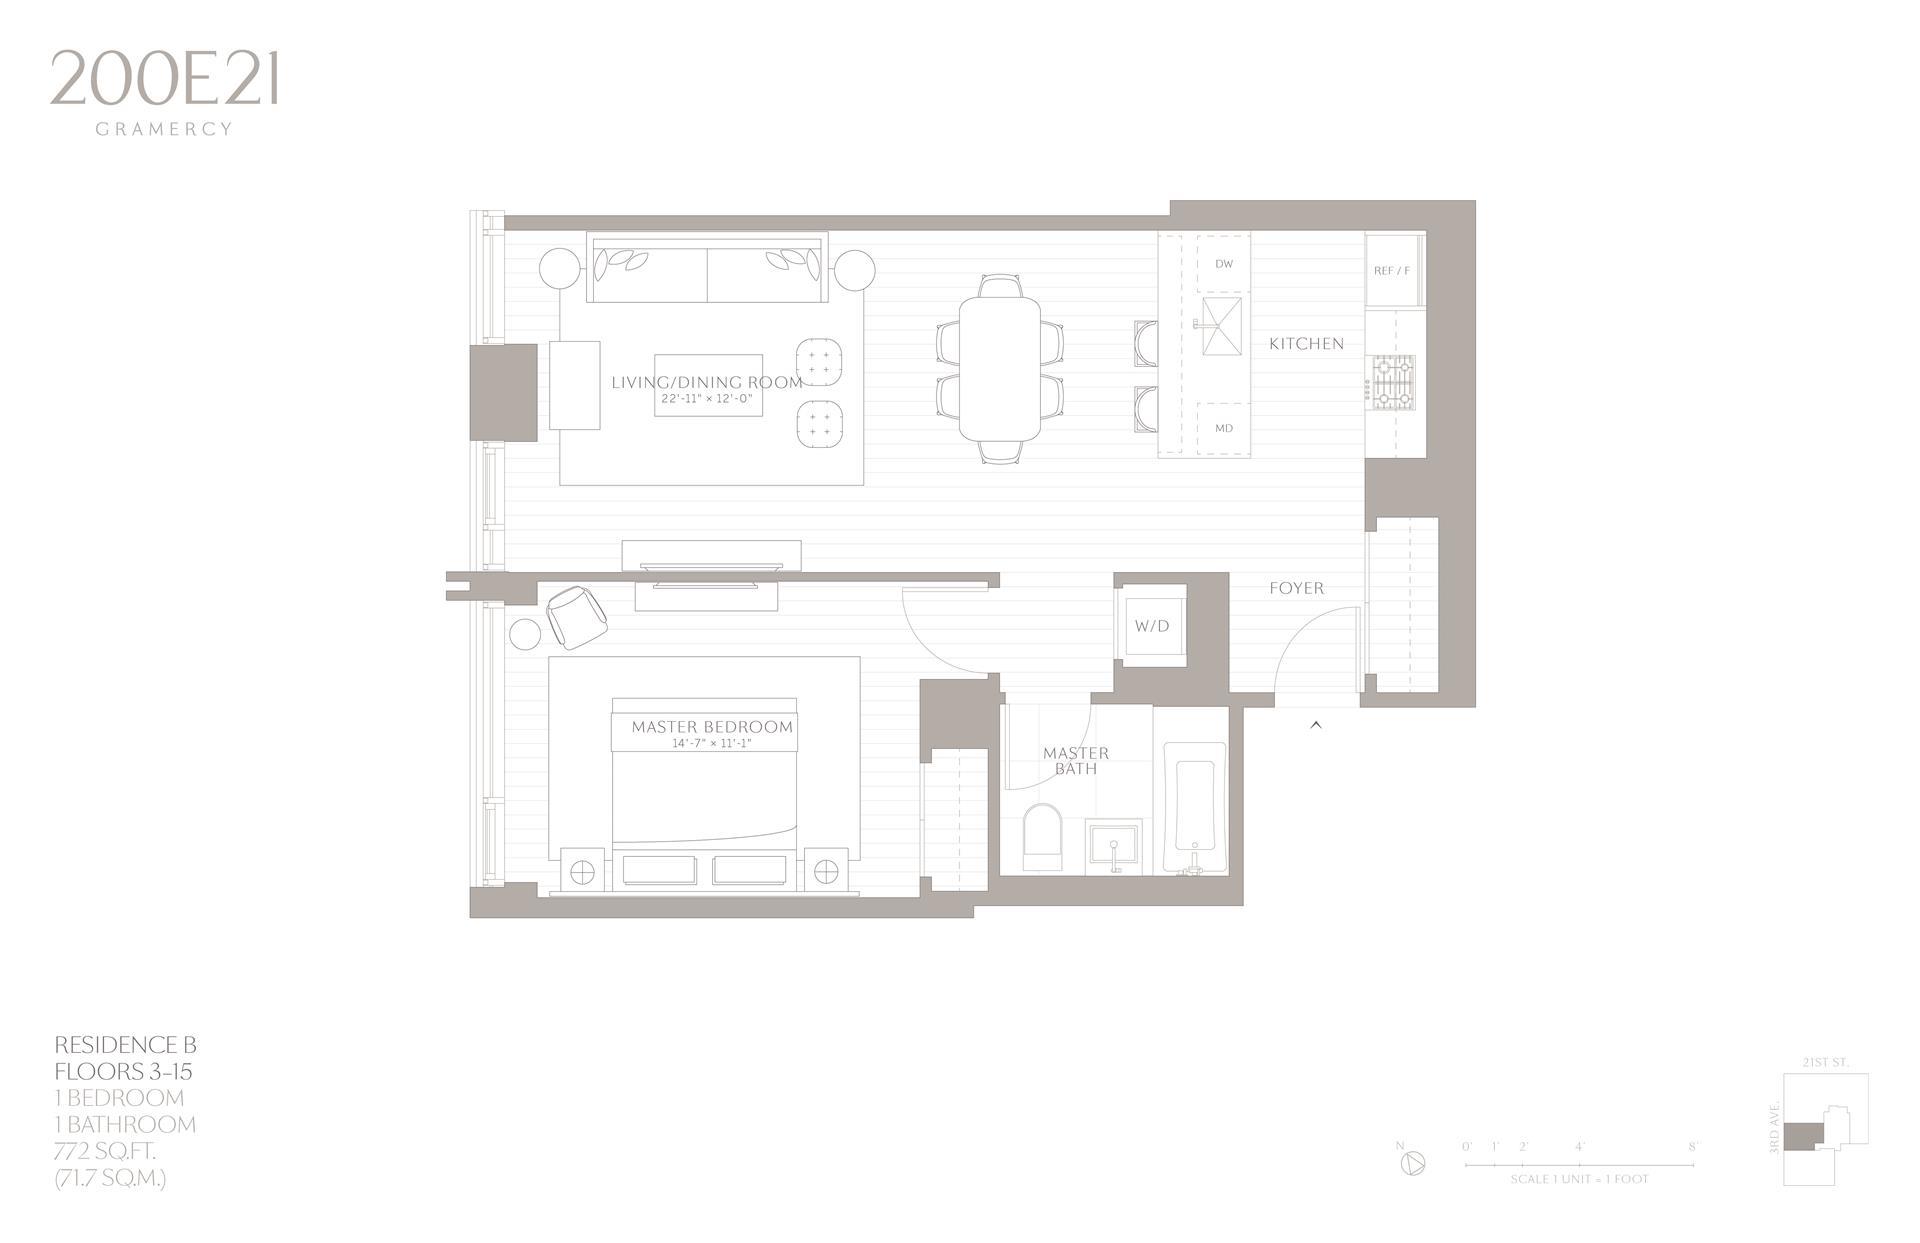 Floor plan of 200 East 21st St, 11B - Gramercy - Union Square, New York